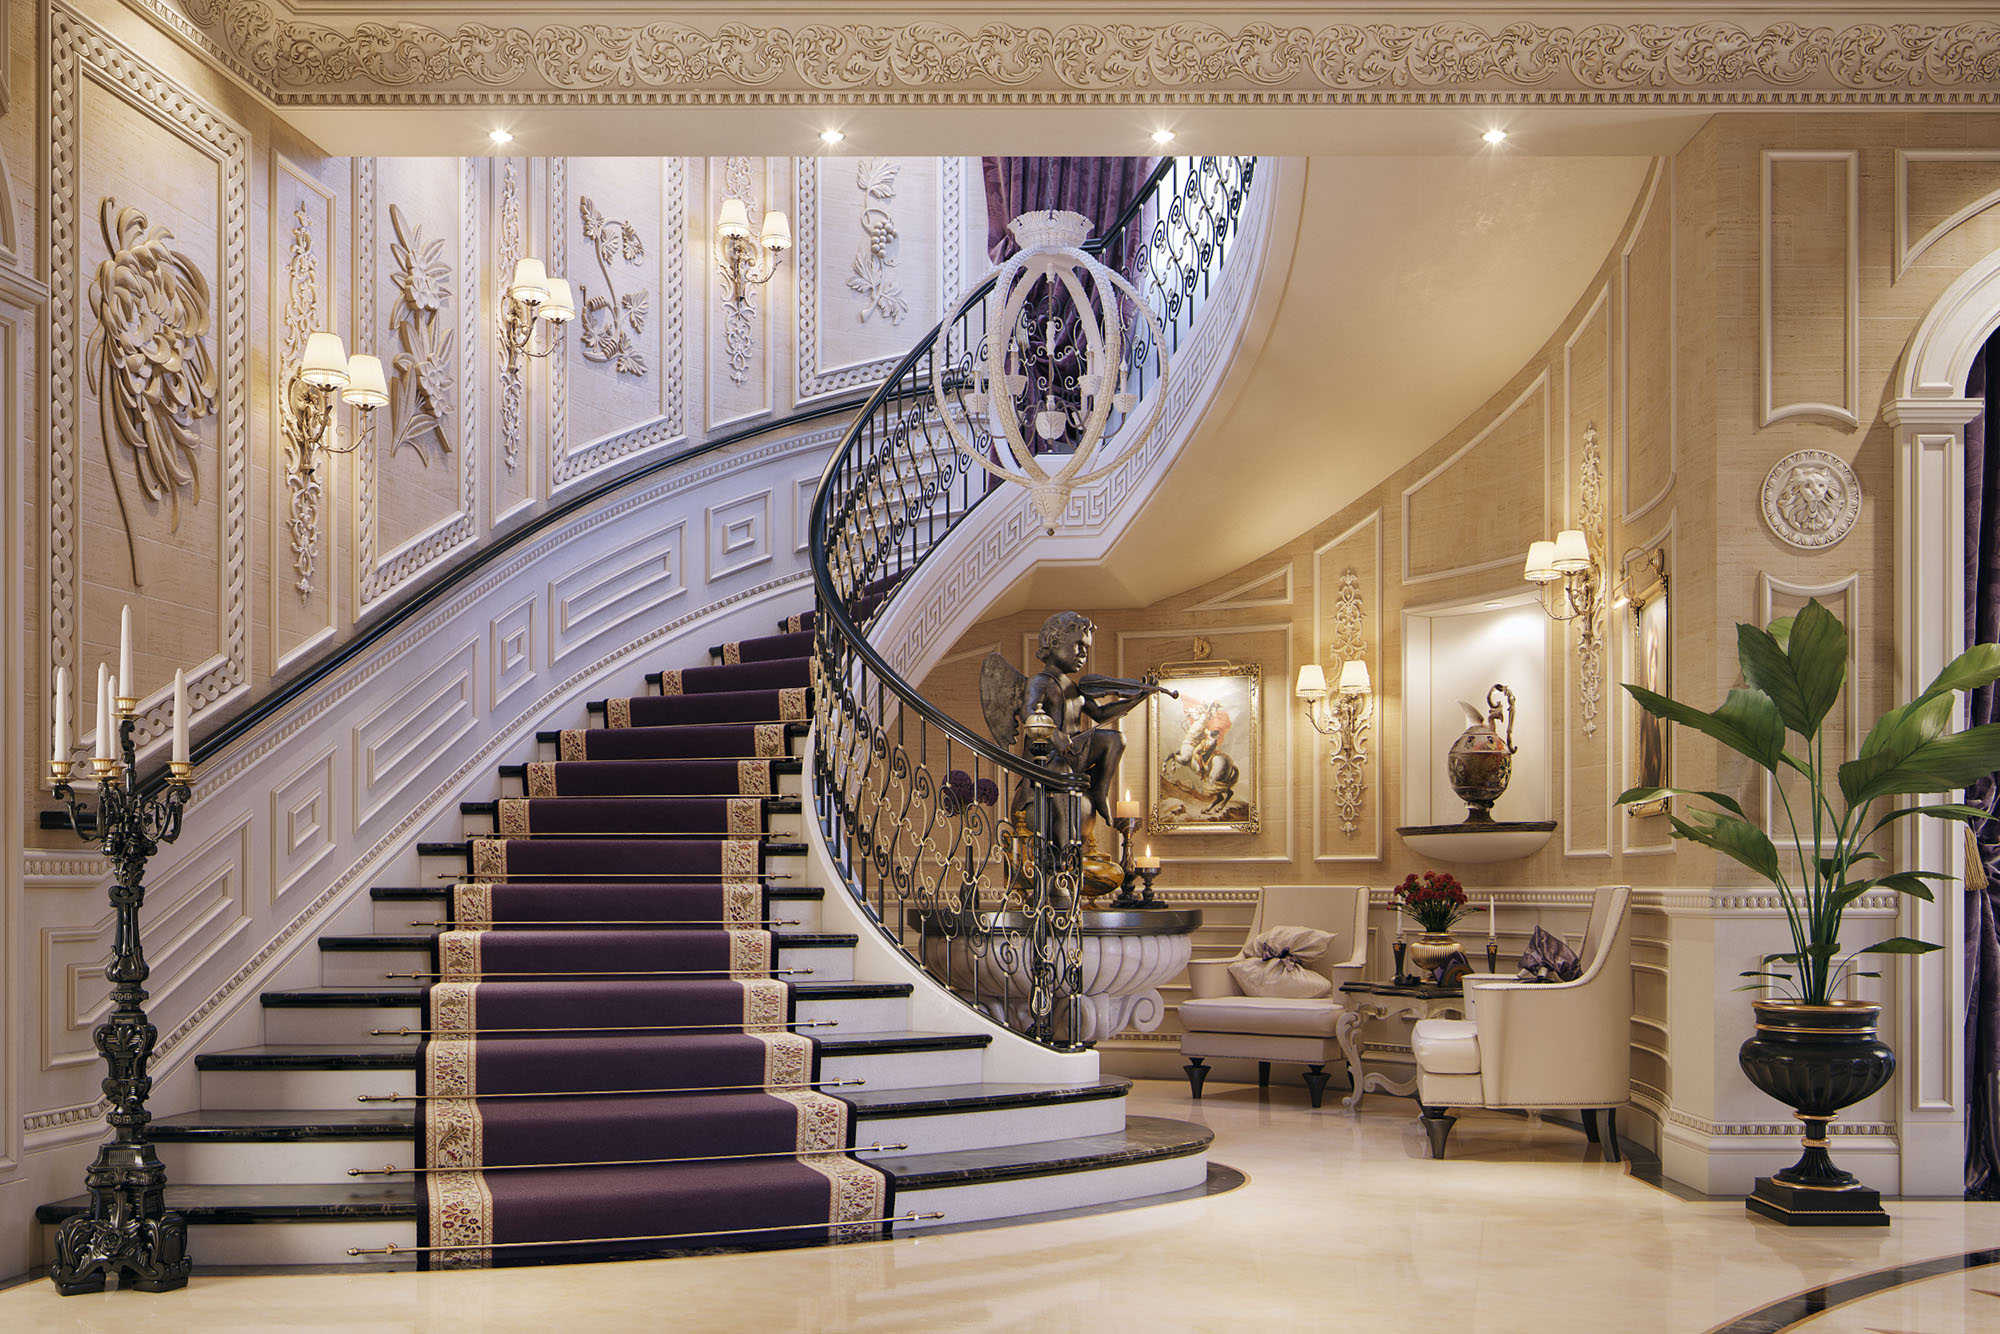 Luxury Mansion Qatar by Taher Studio_04.jpg